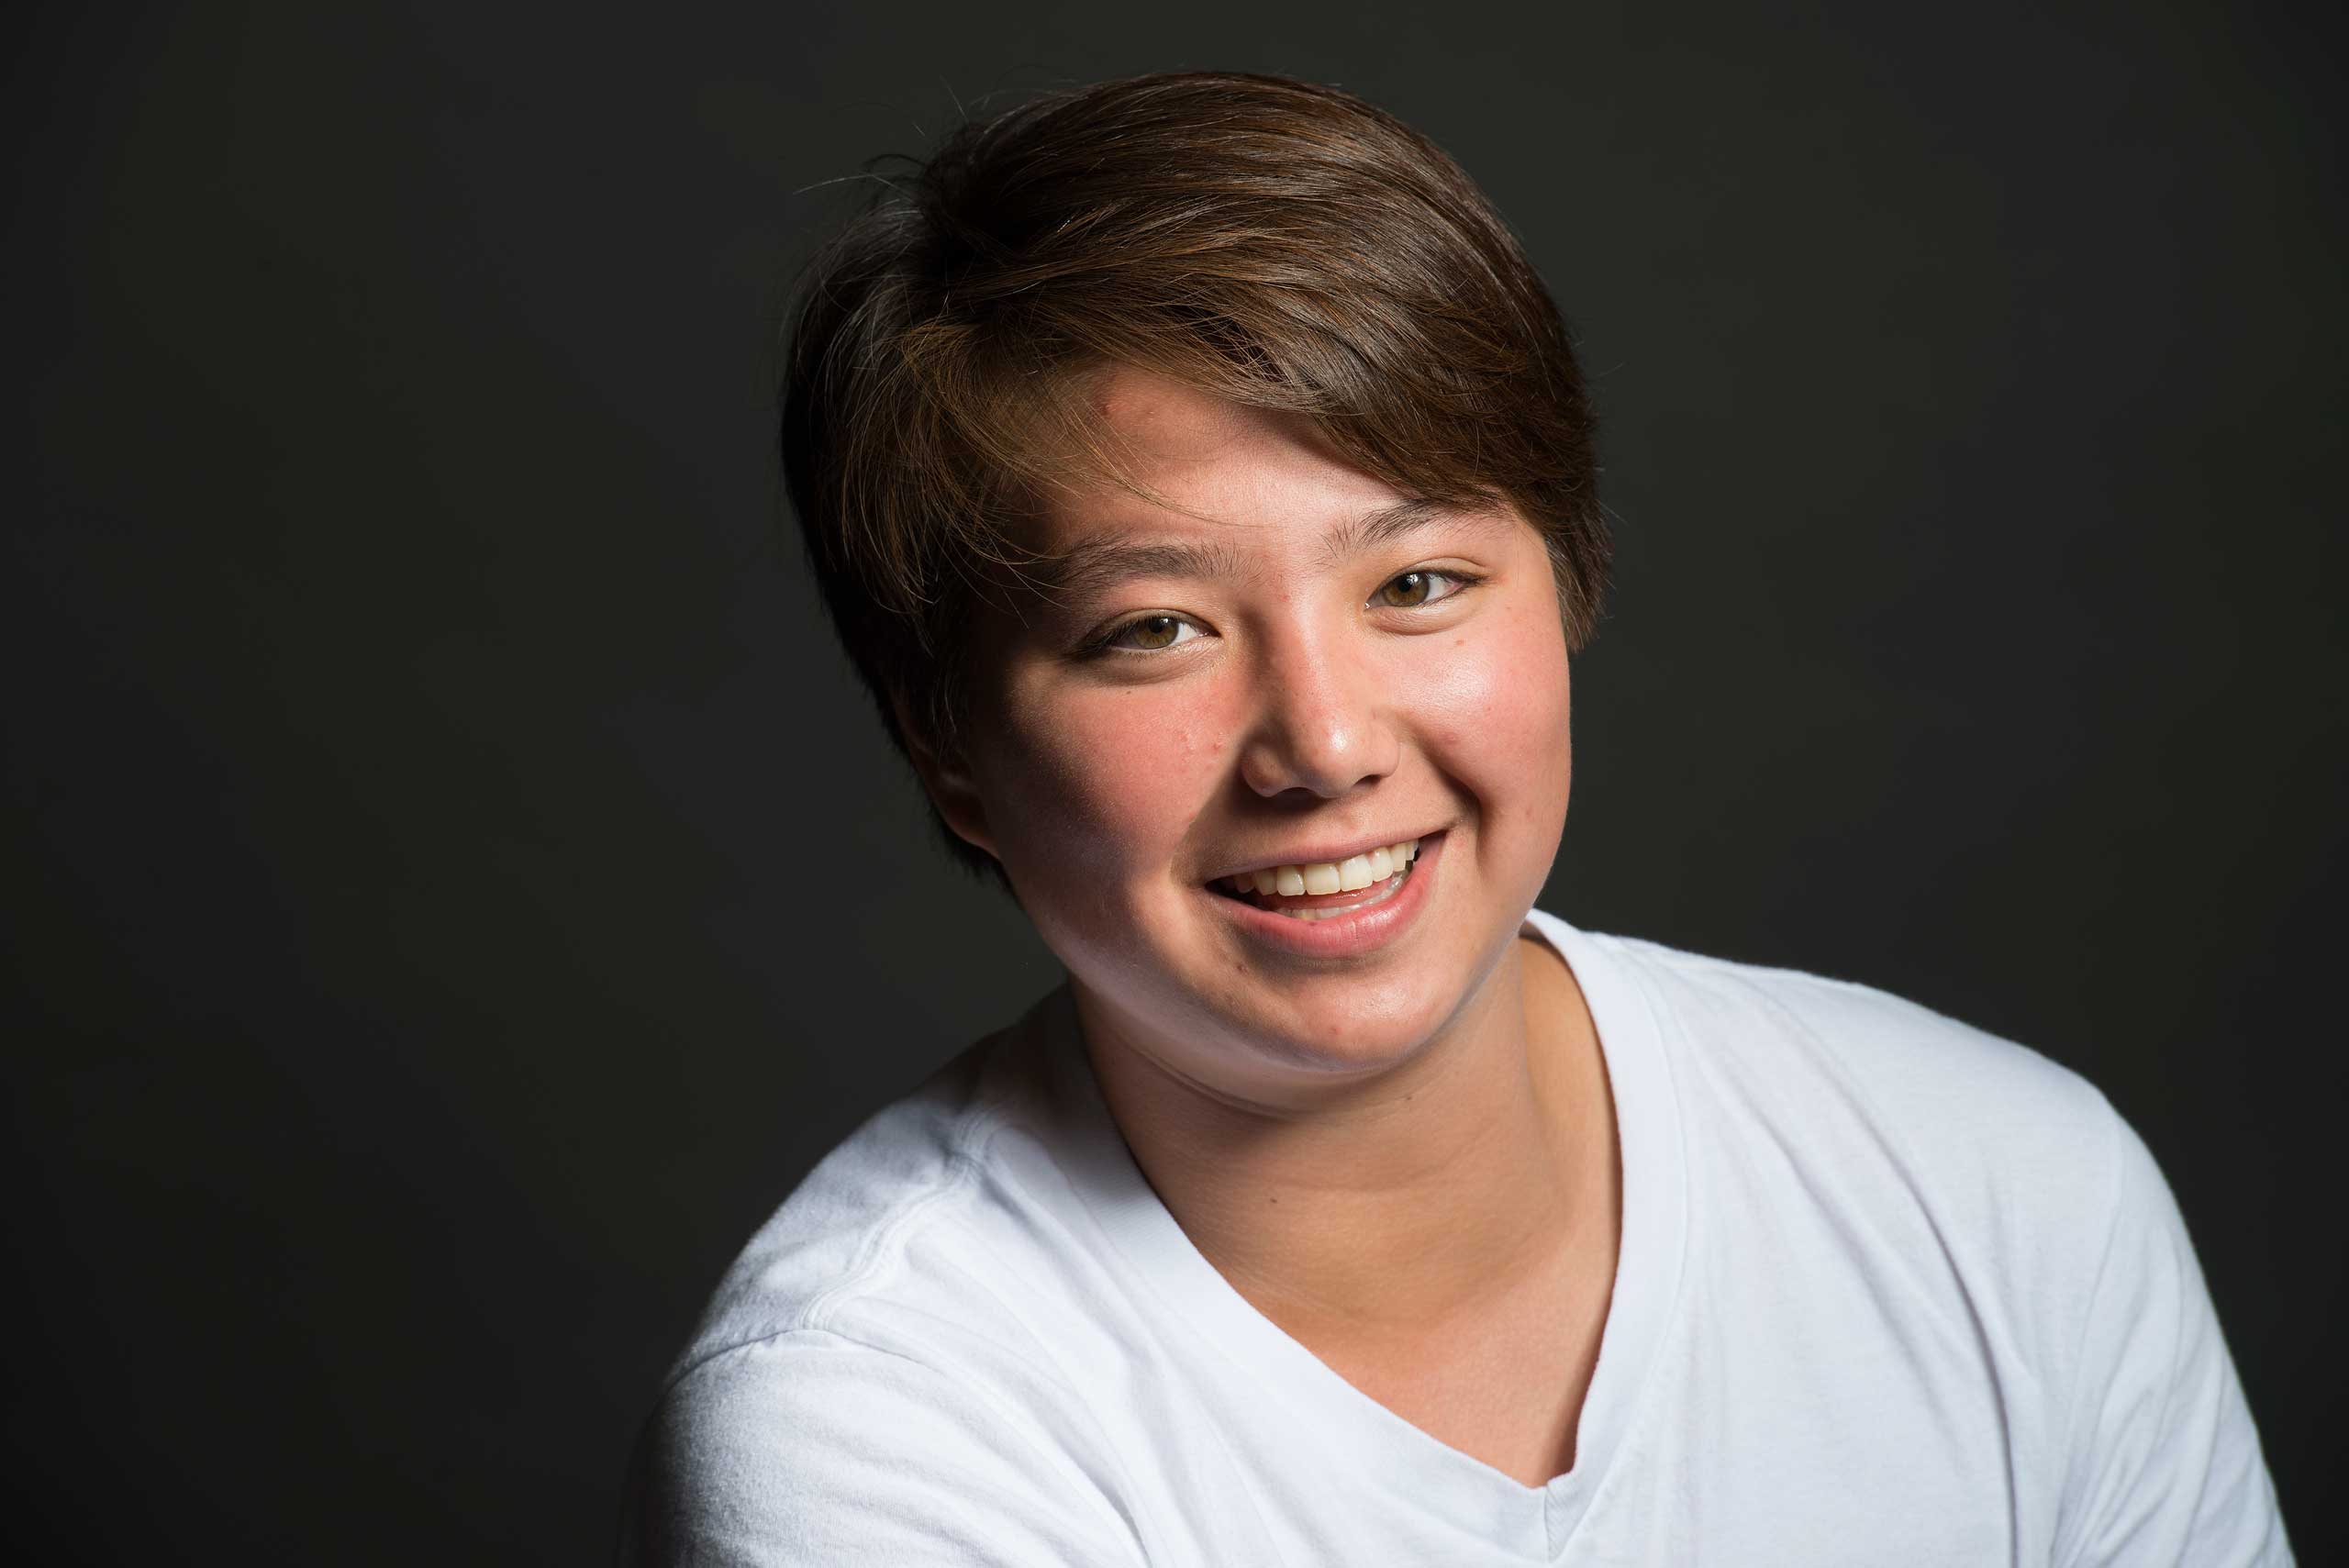 Schuyler Bailer is  the first openly transgender collegiate athlete.